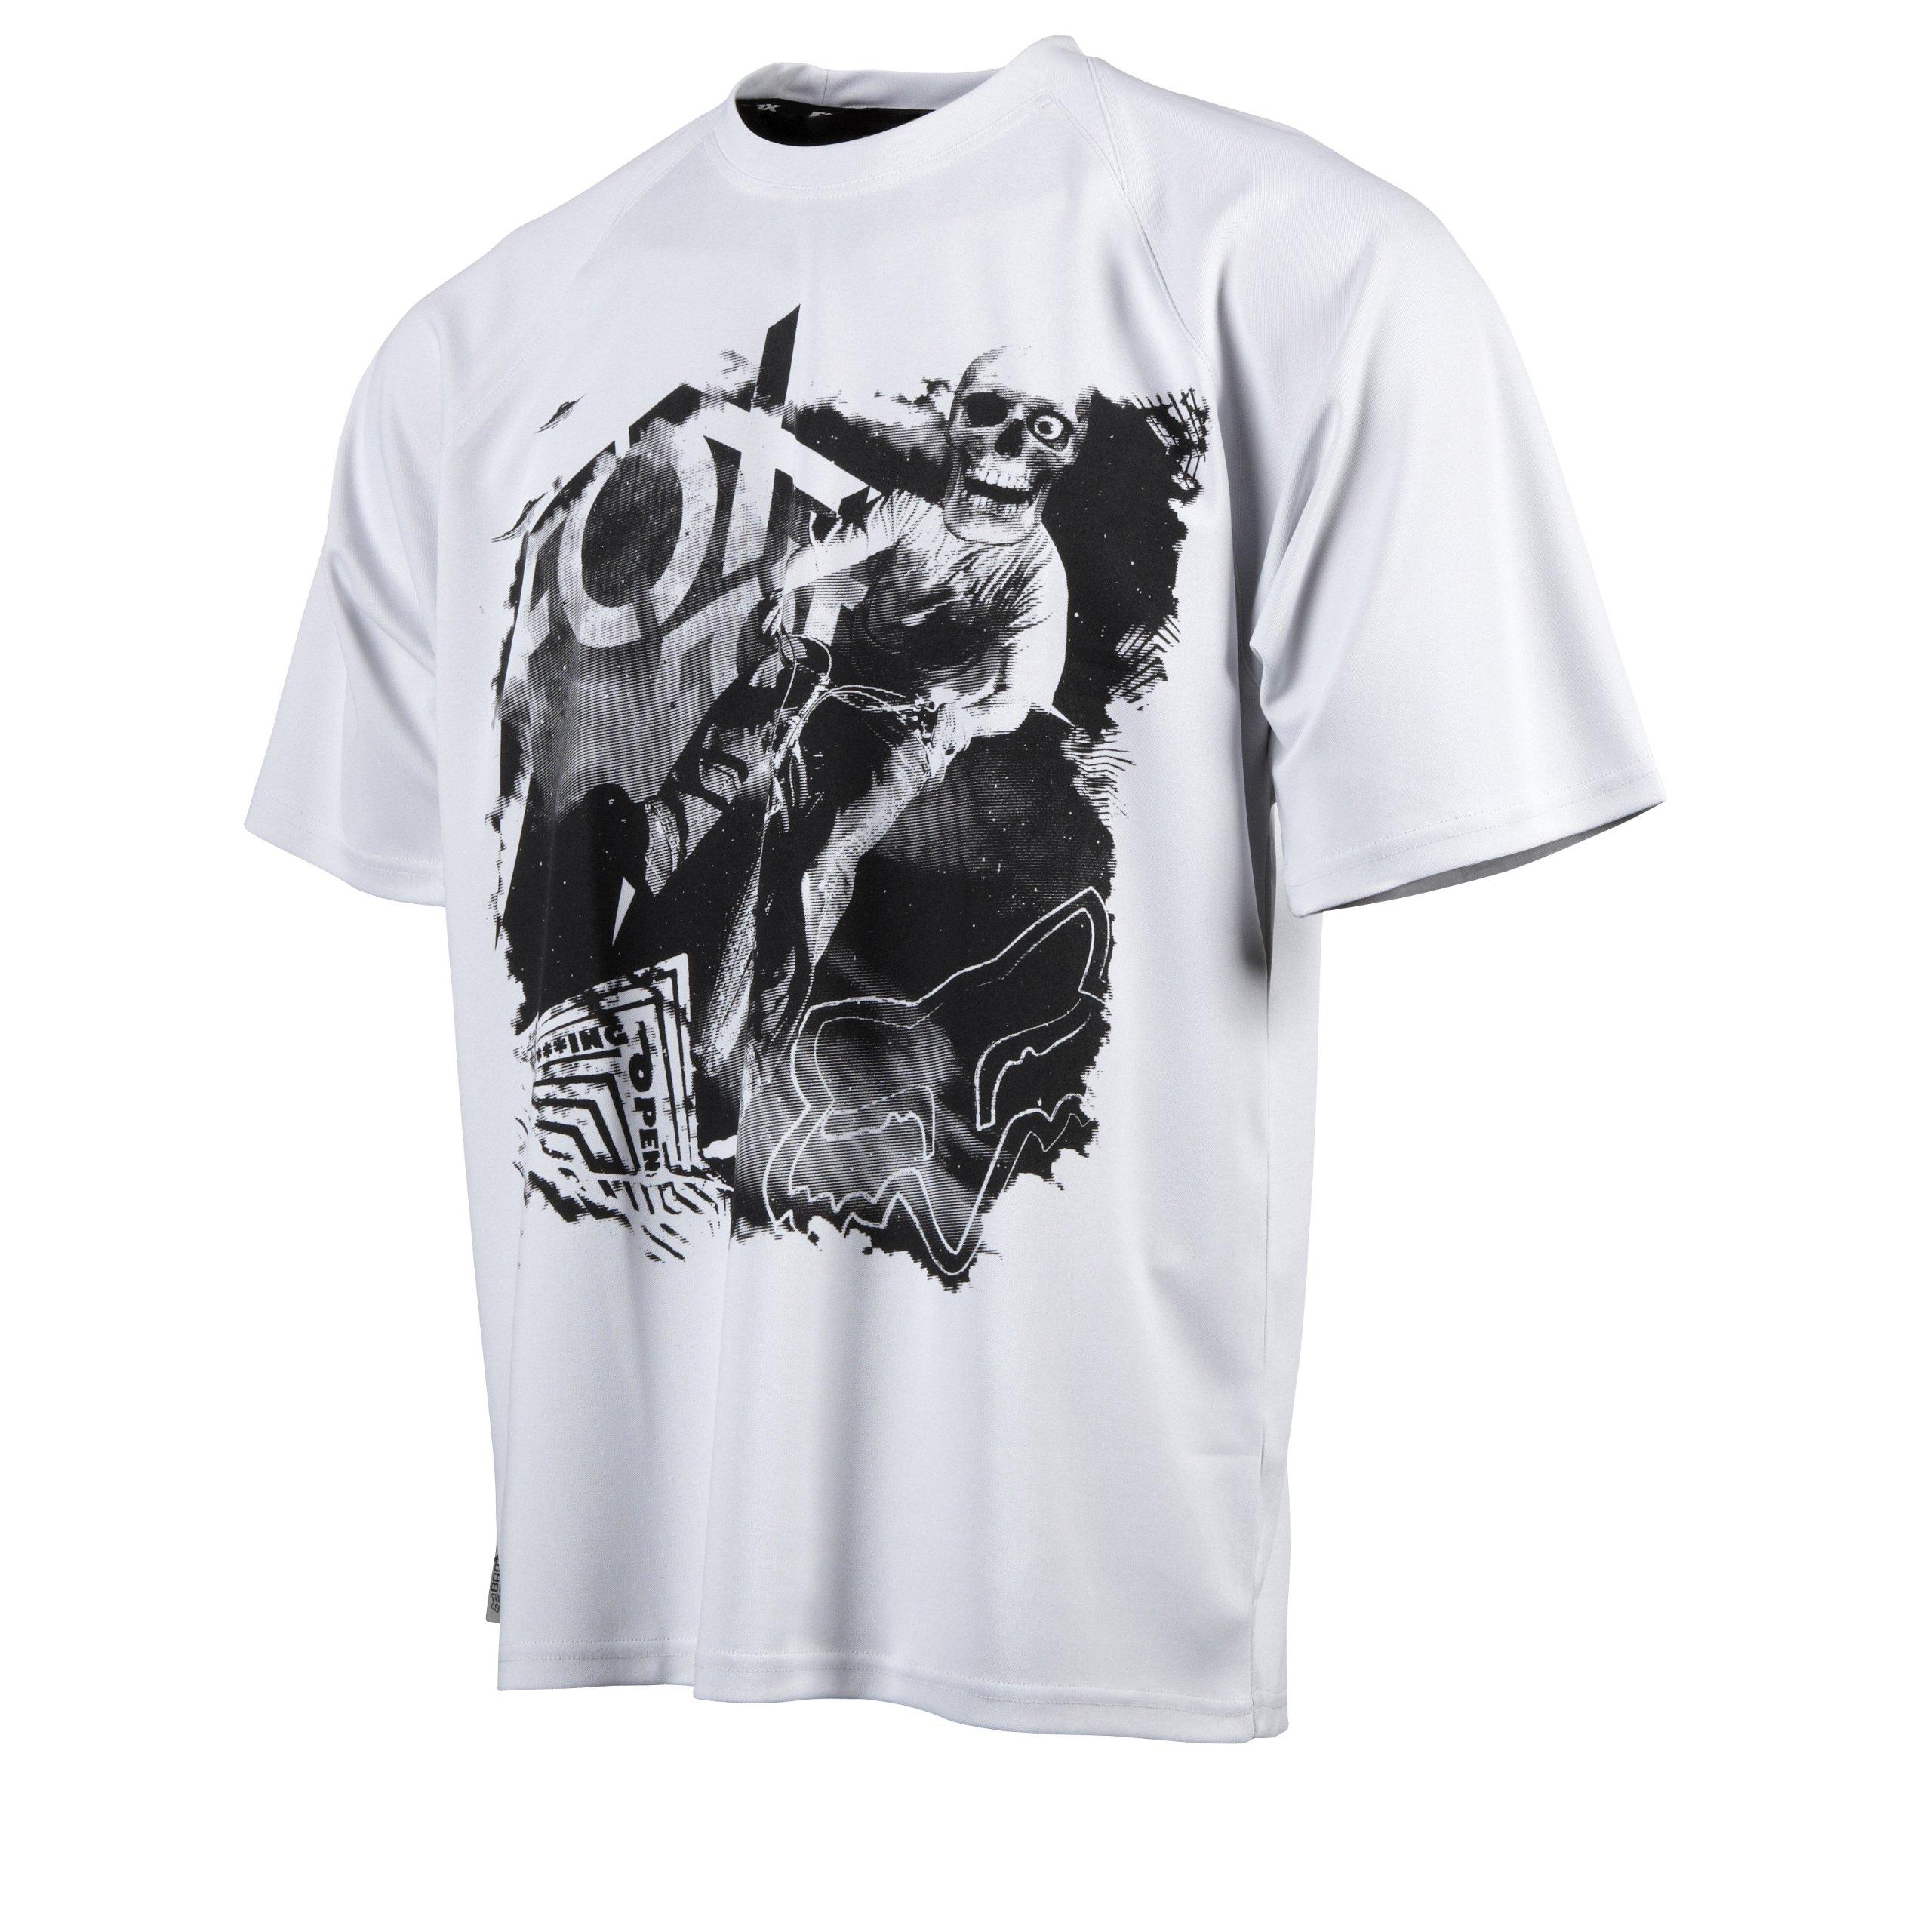 Fox Men's WFO Dirt Short Sleeve Shirt Jersey,White,Medium